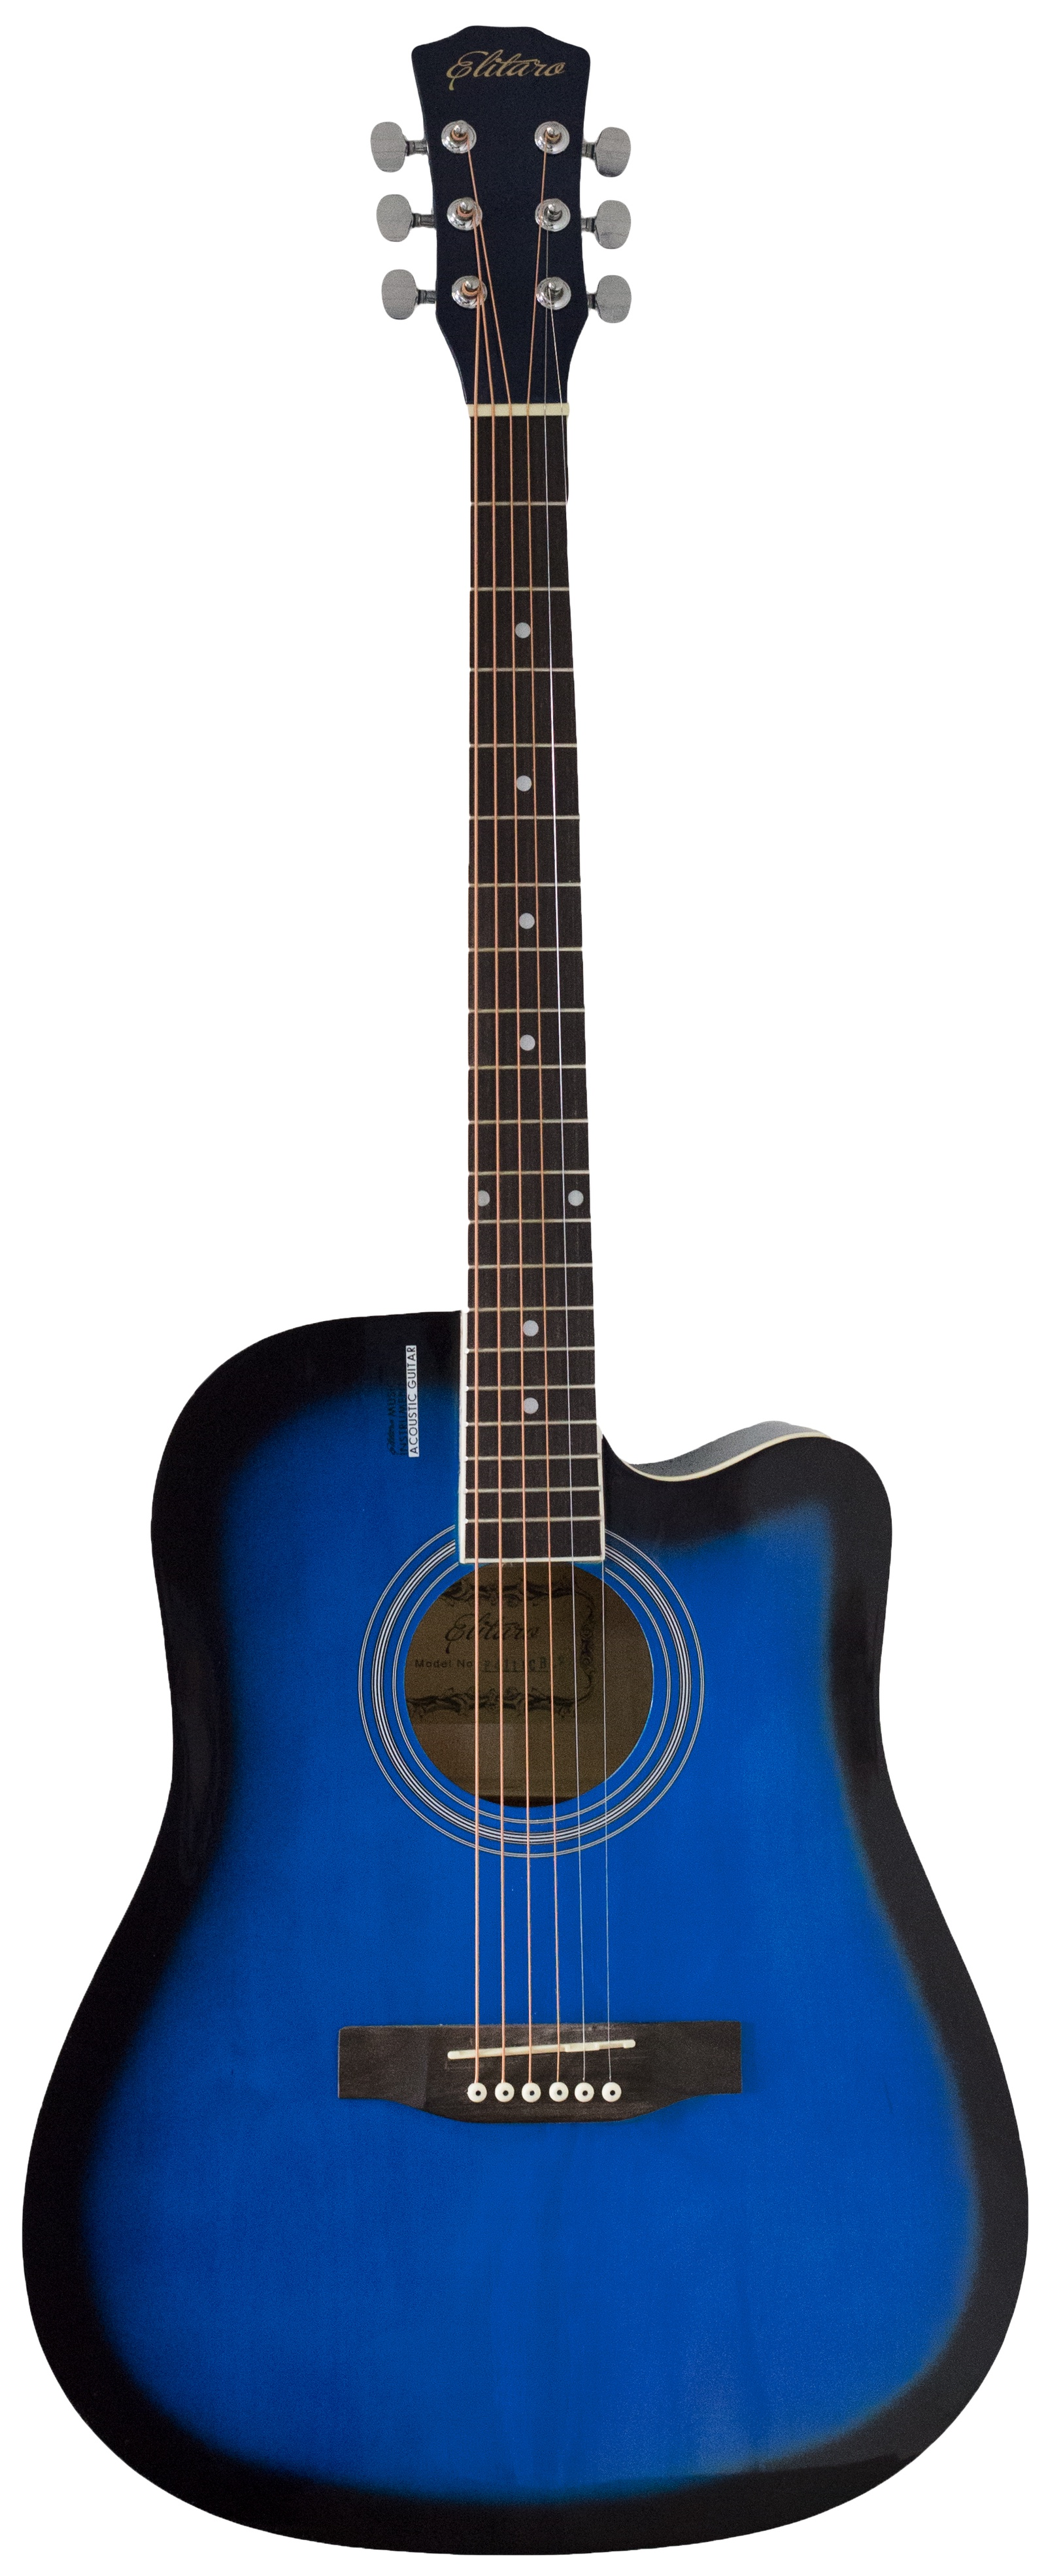 Elitaro-E4110C-Blue-akusticheskaya-gitara-150945740